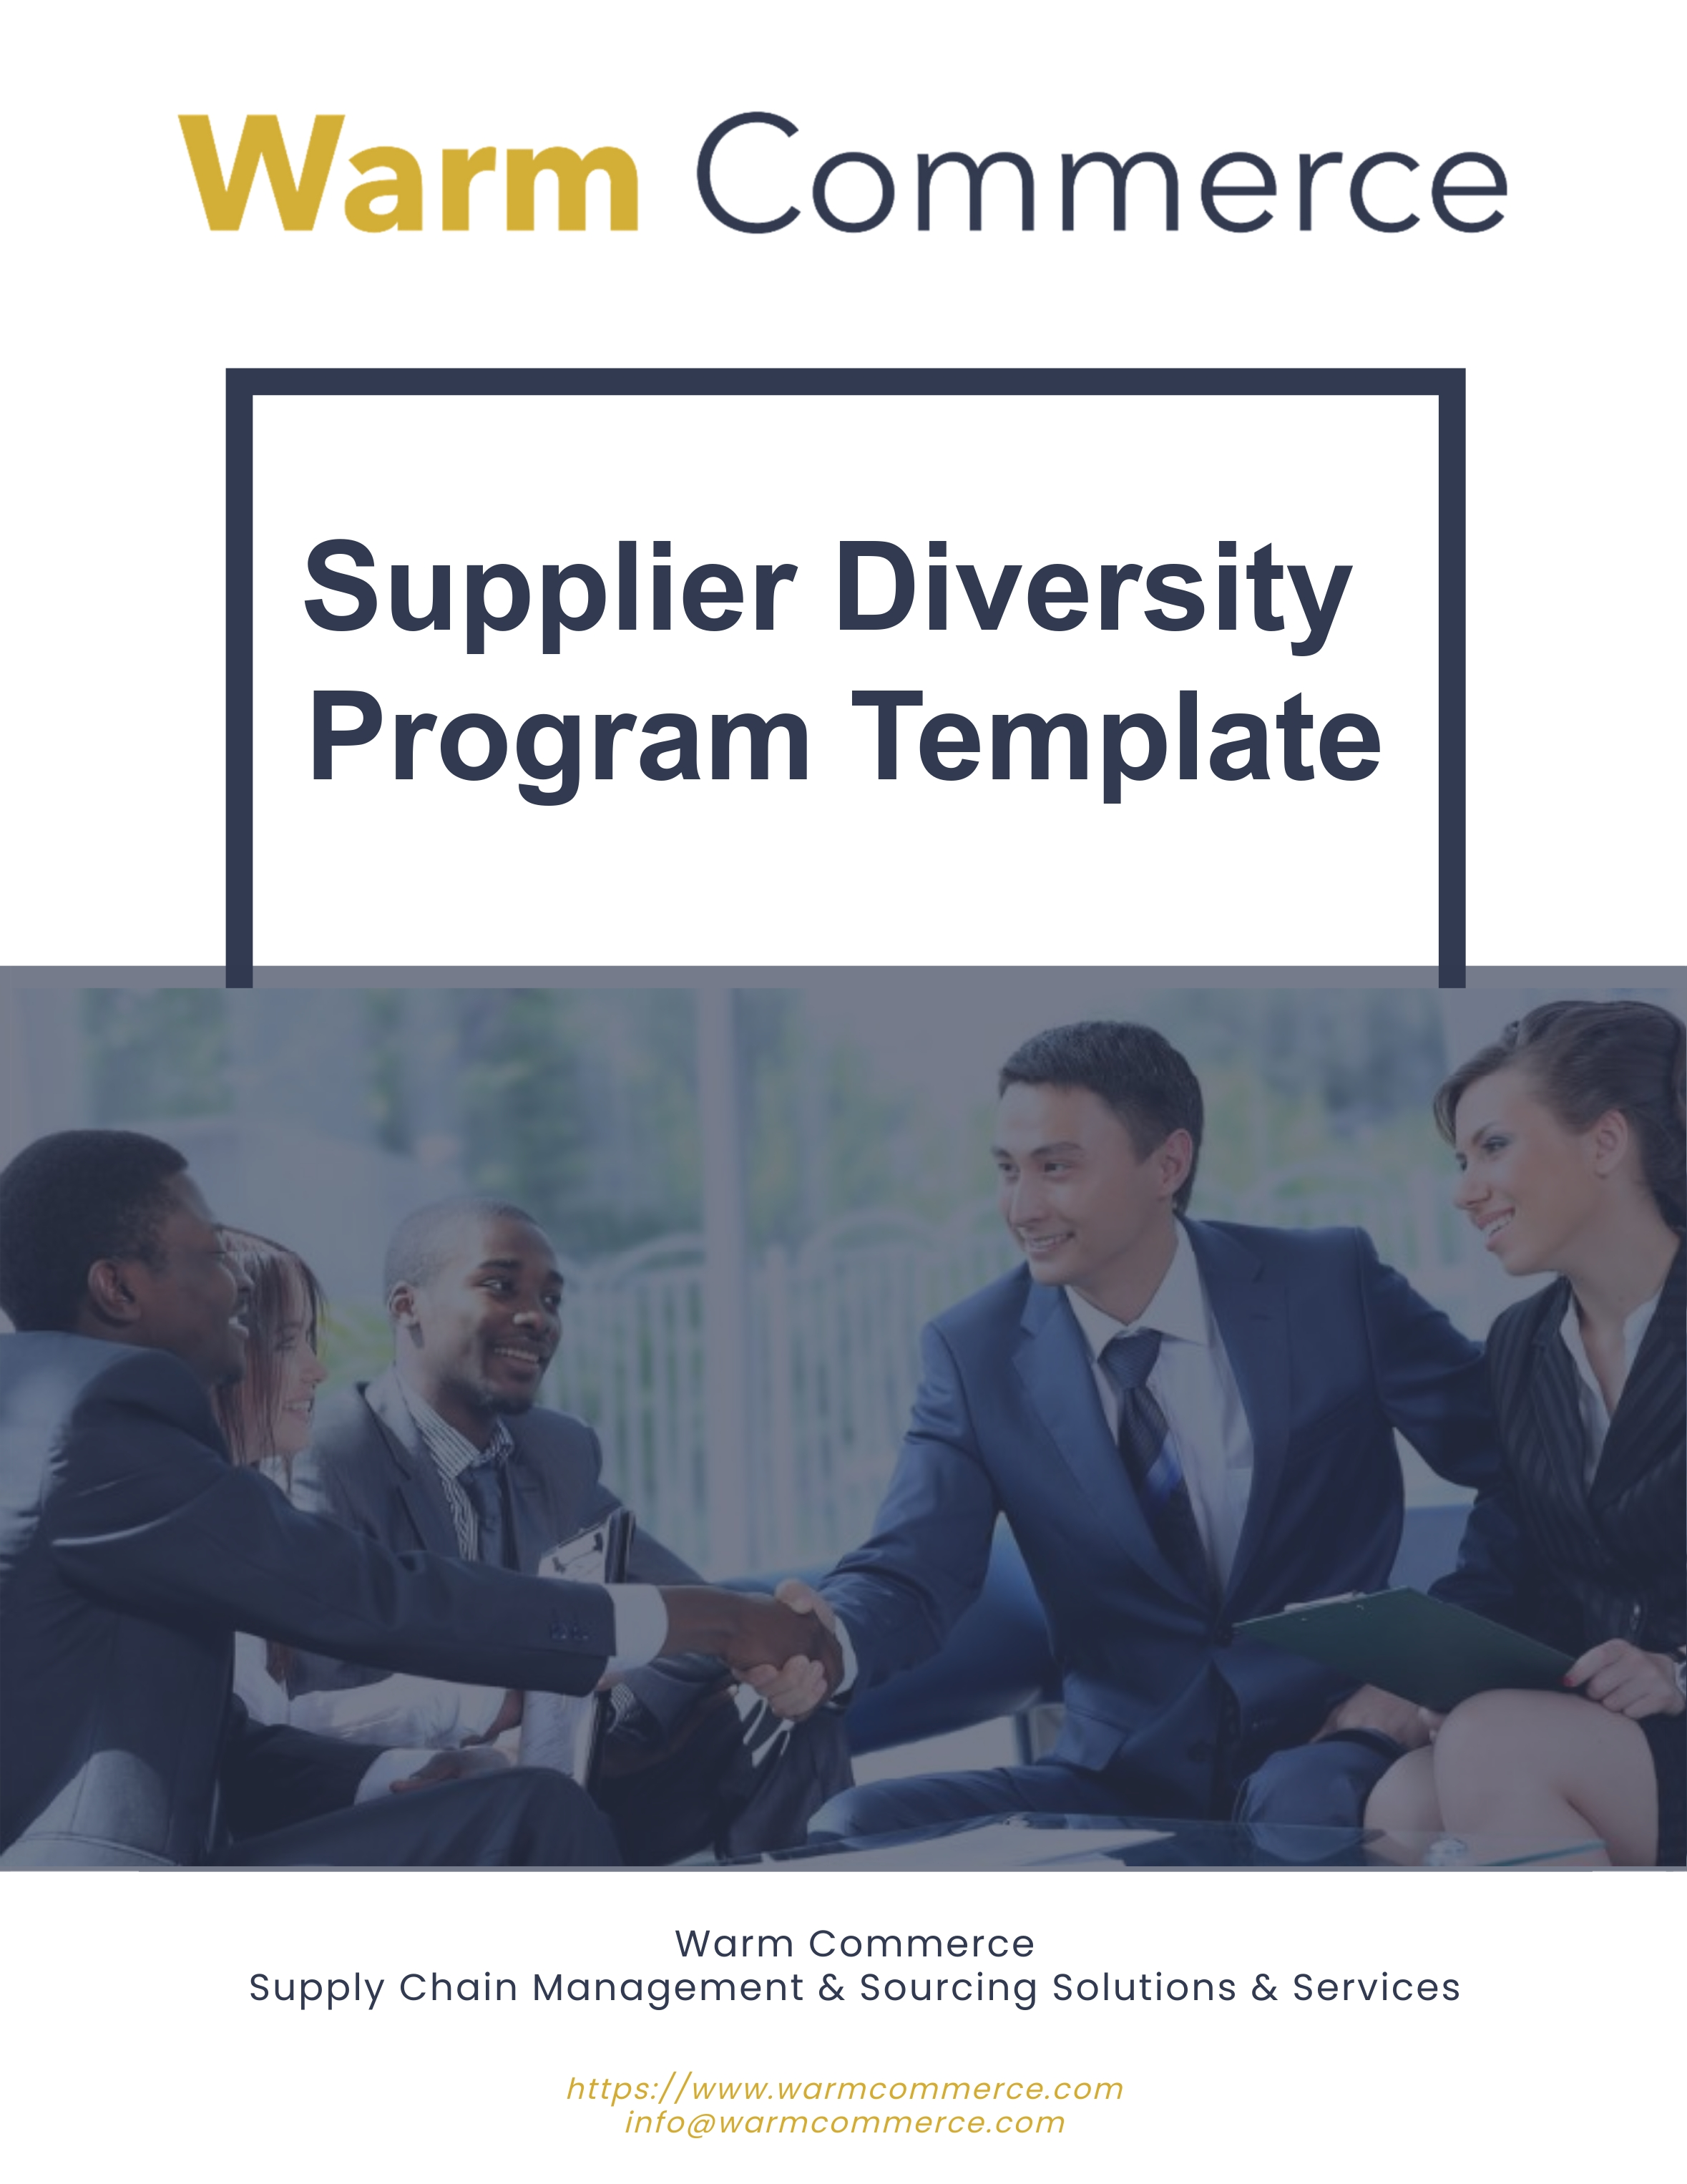 Free Supplier Diversity Program Template